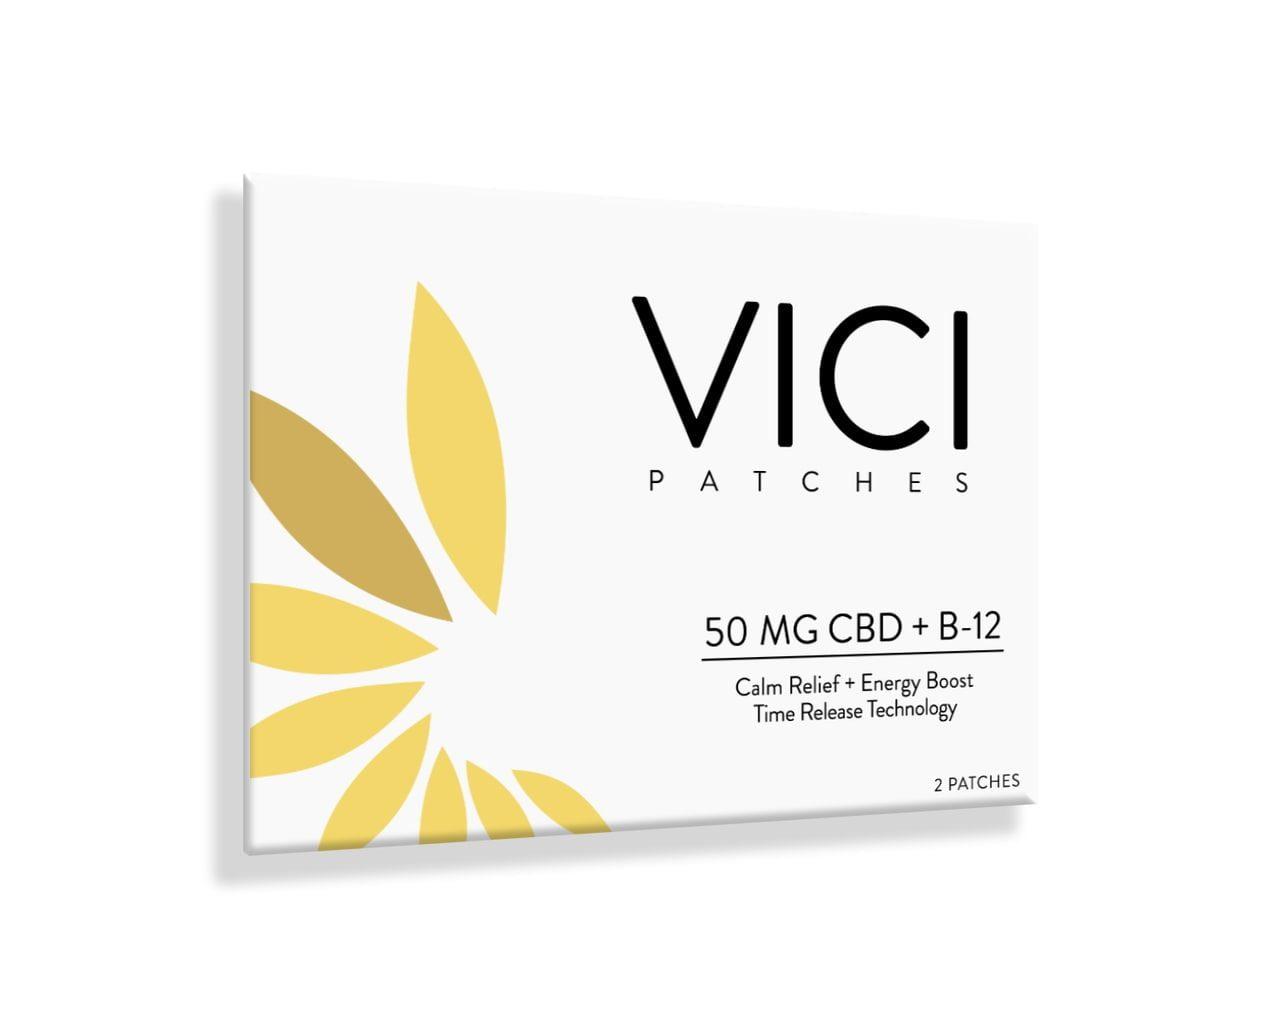 vici-wellness-cbd-patches-cbd-b12-2-count-50mg-of-cbd